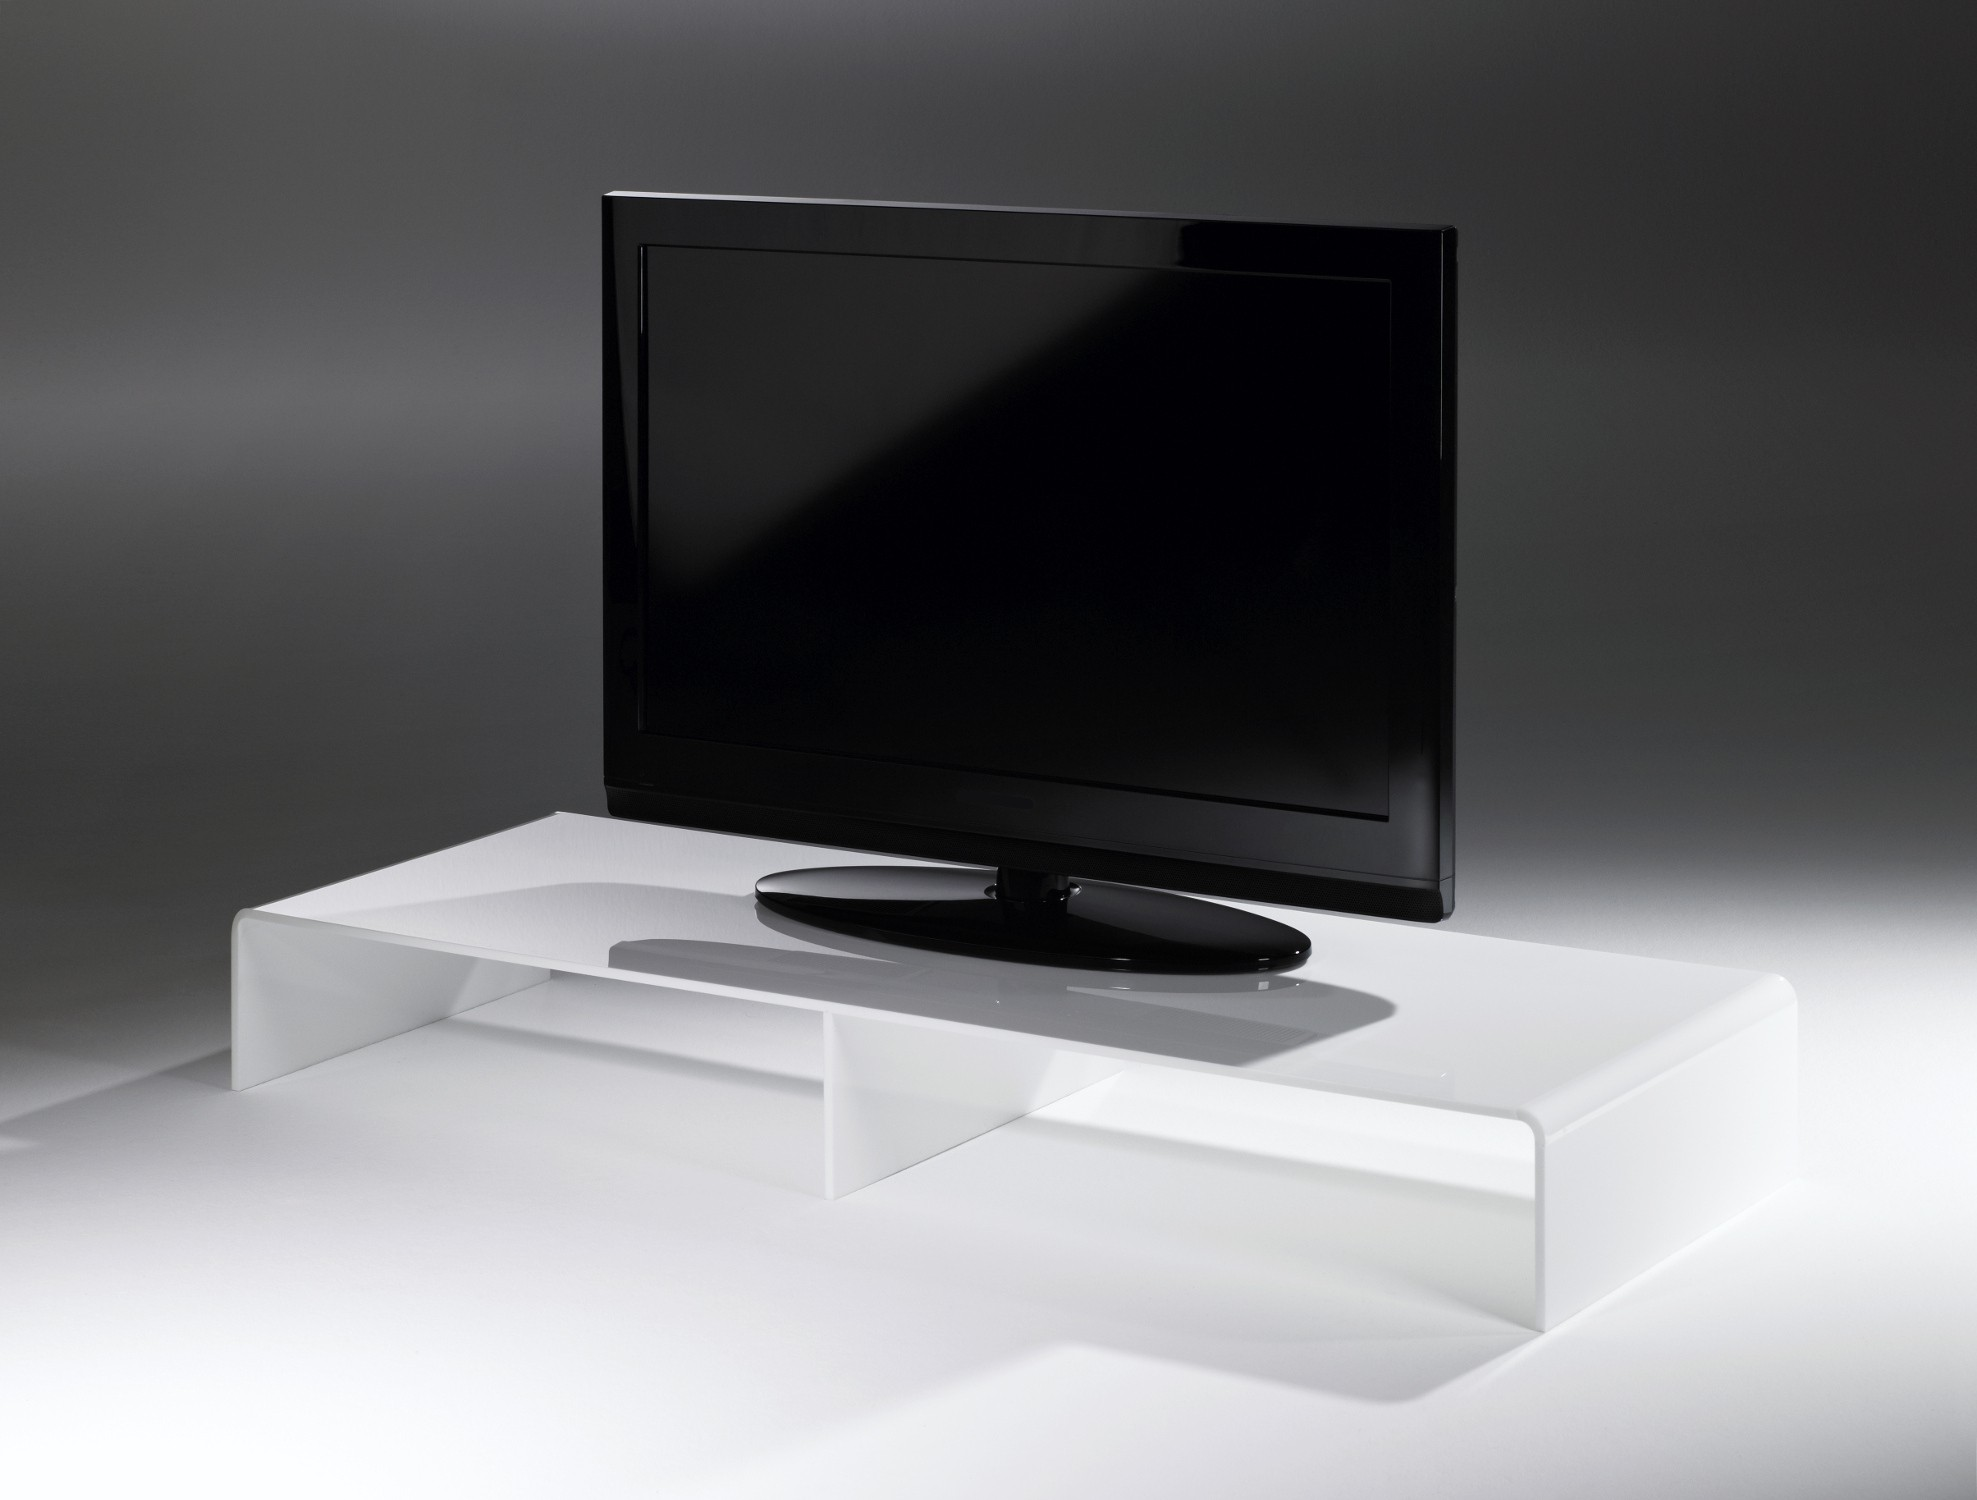 tv konsole new york breite 110 cm acrylglas wei wohnen tv m bel tv lowboards. Black Bedroom Furniture Sets. Home Design Ideas